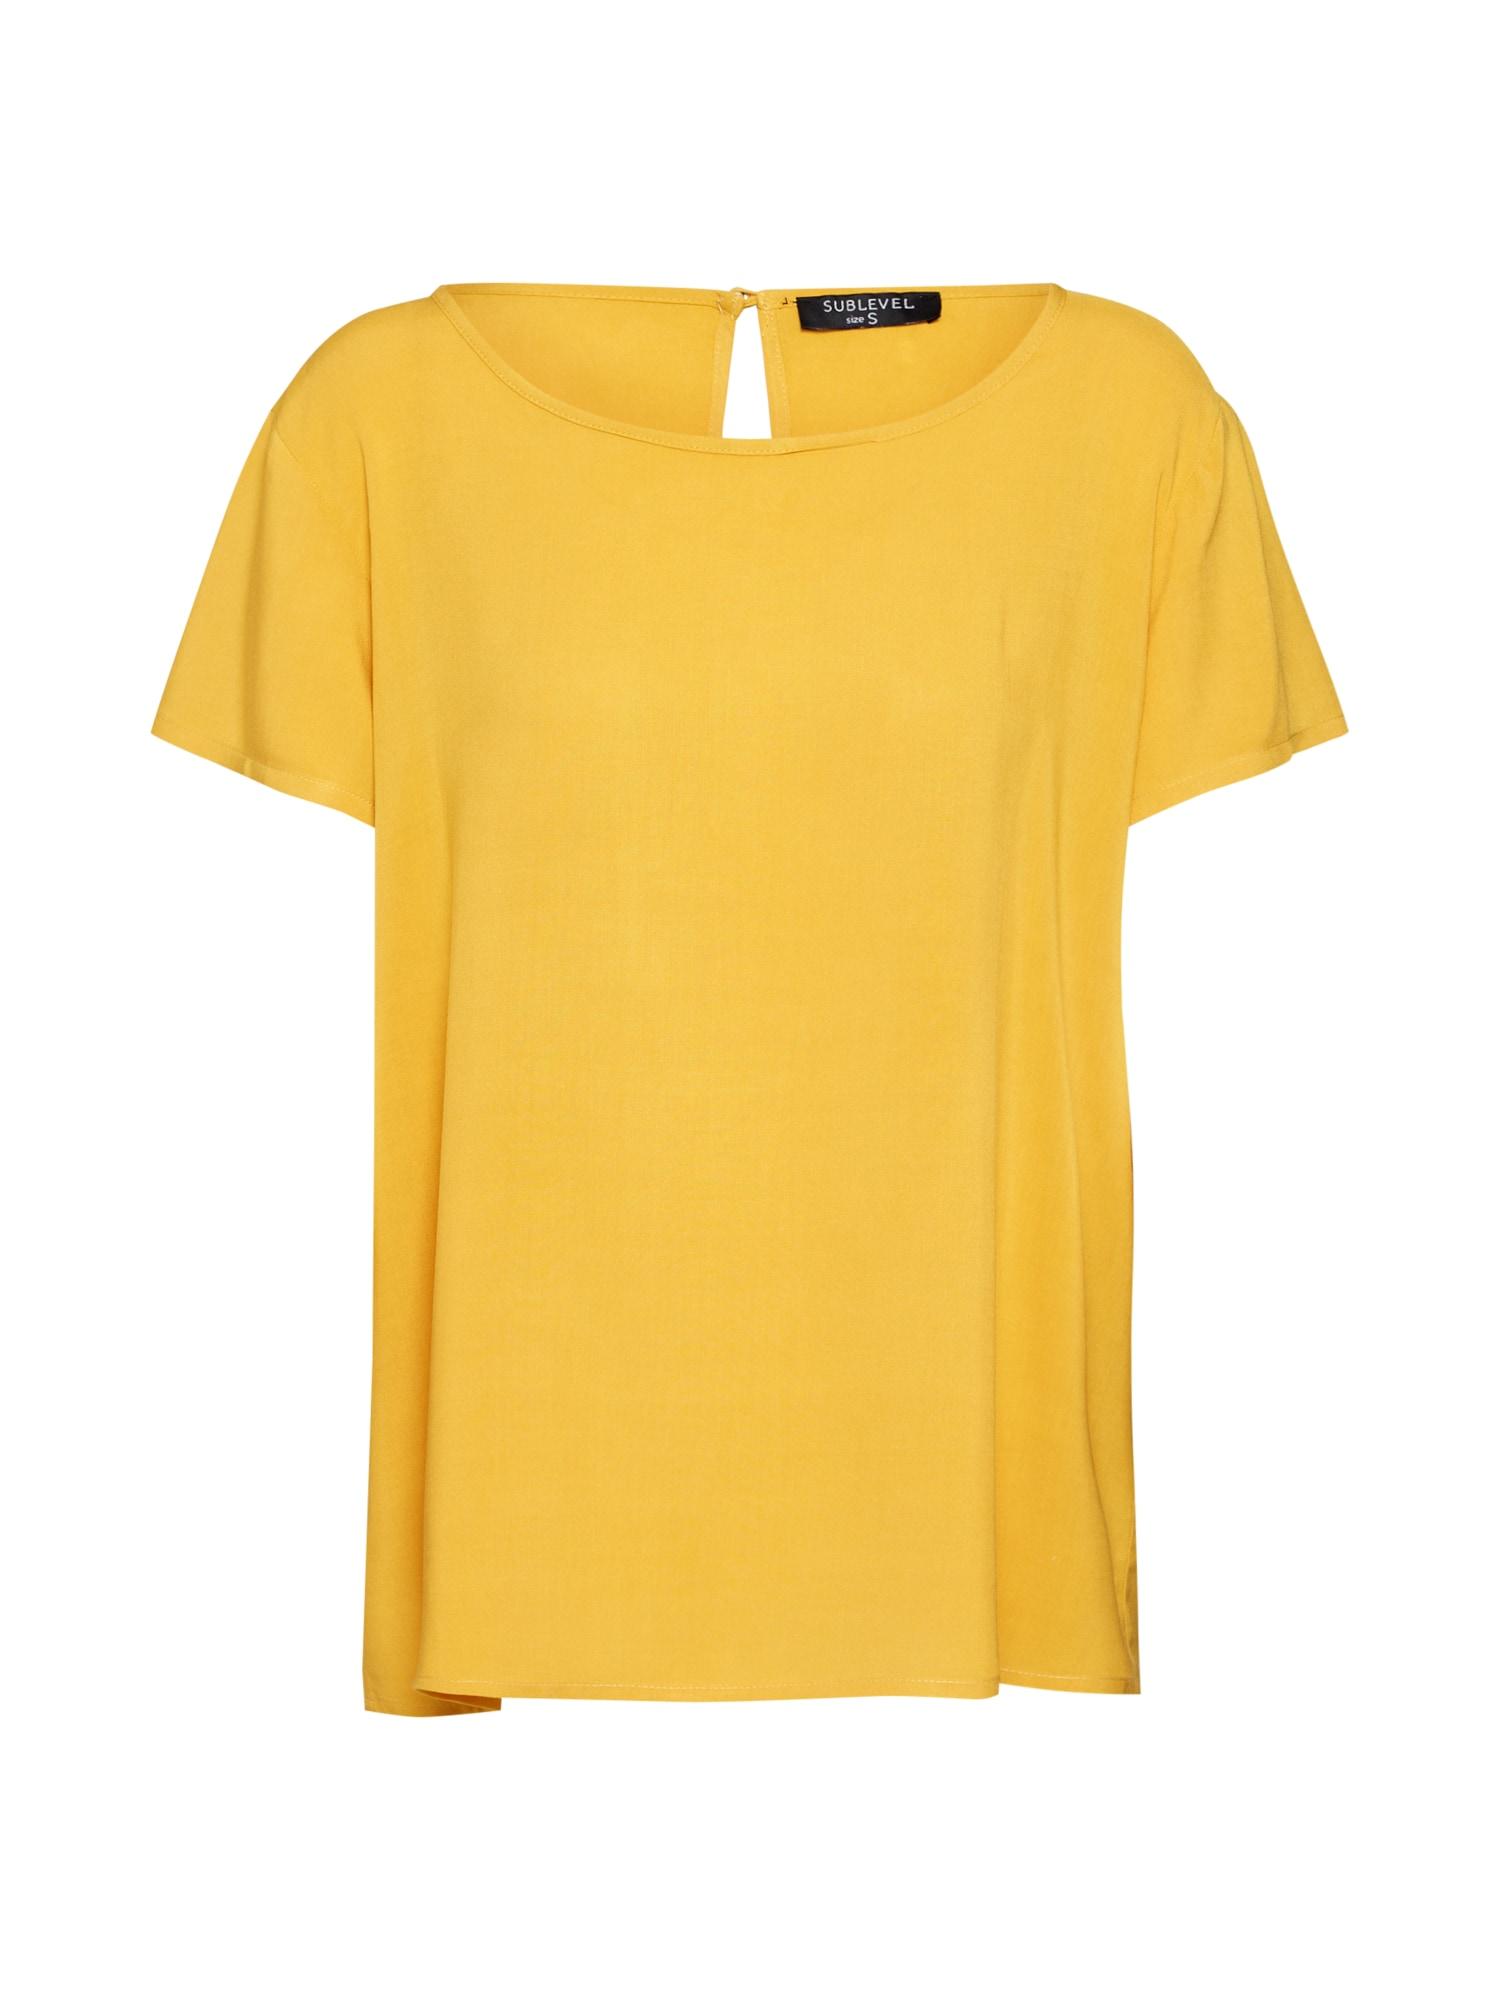 Tričko D73760M10953B žlutá Sublevel